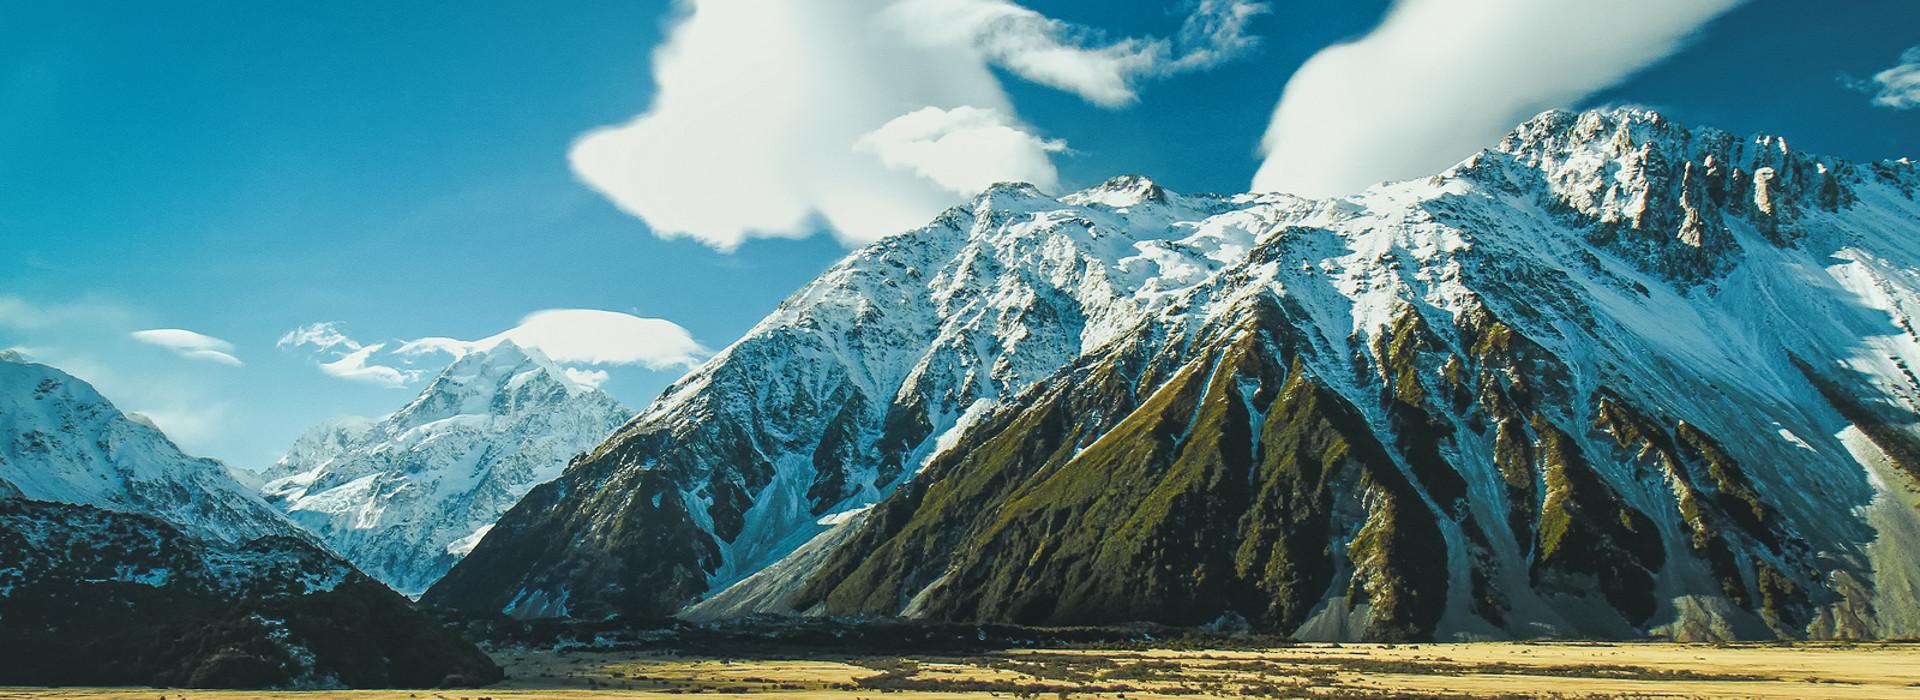 Aoraki-Mt. Cook National Park.jpg, New Zealand @Wikimedia Commons